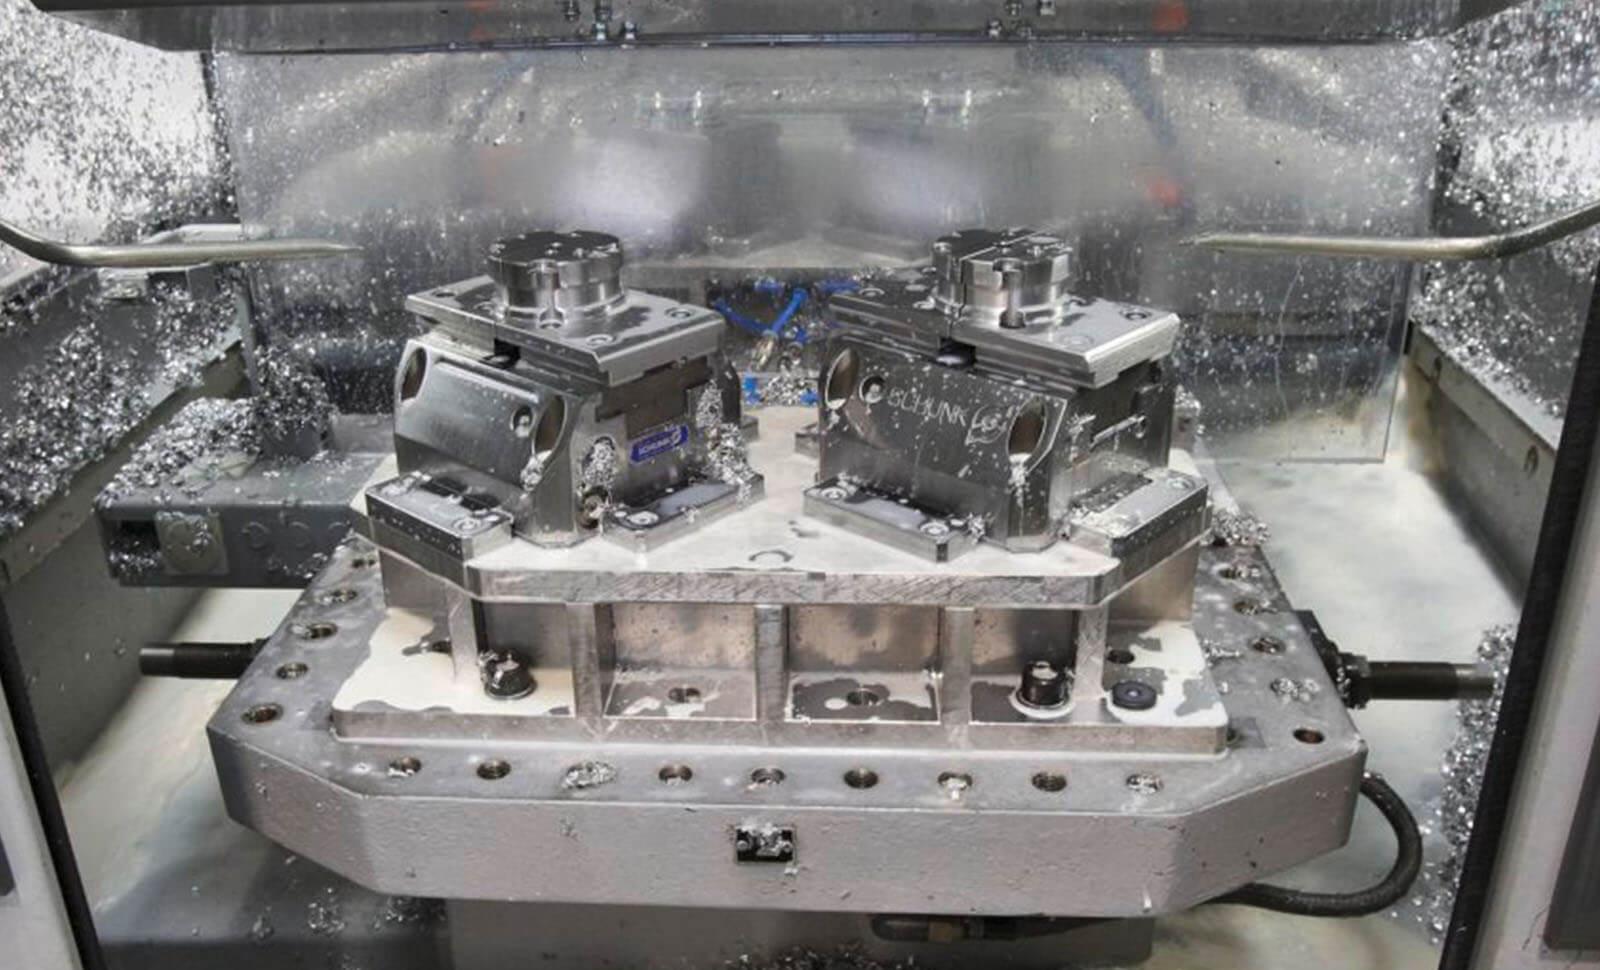 Mechanische Bearbeitung von Metall